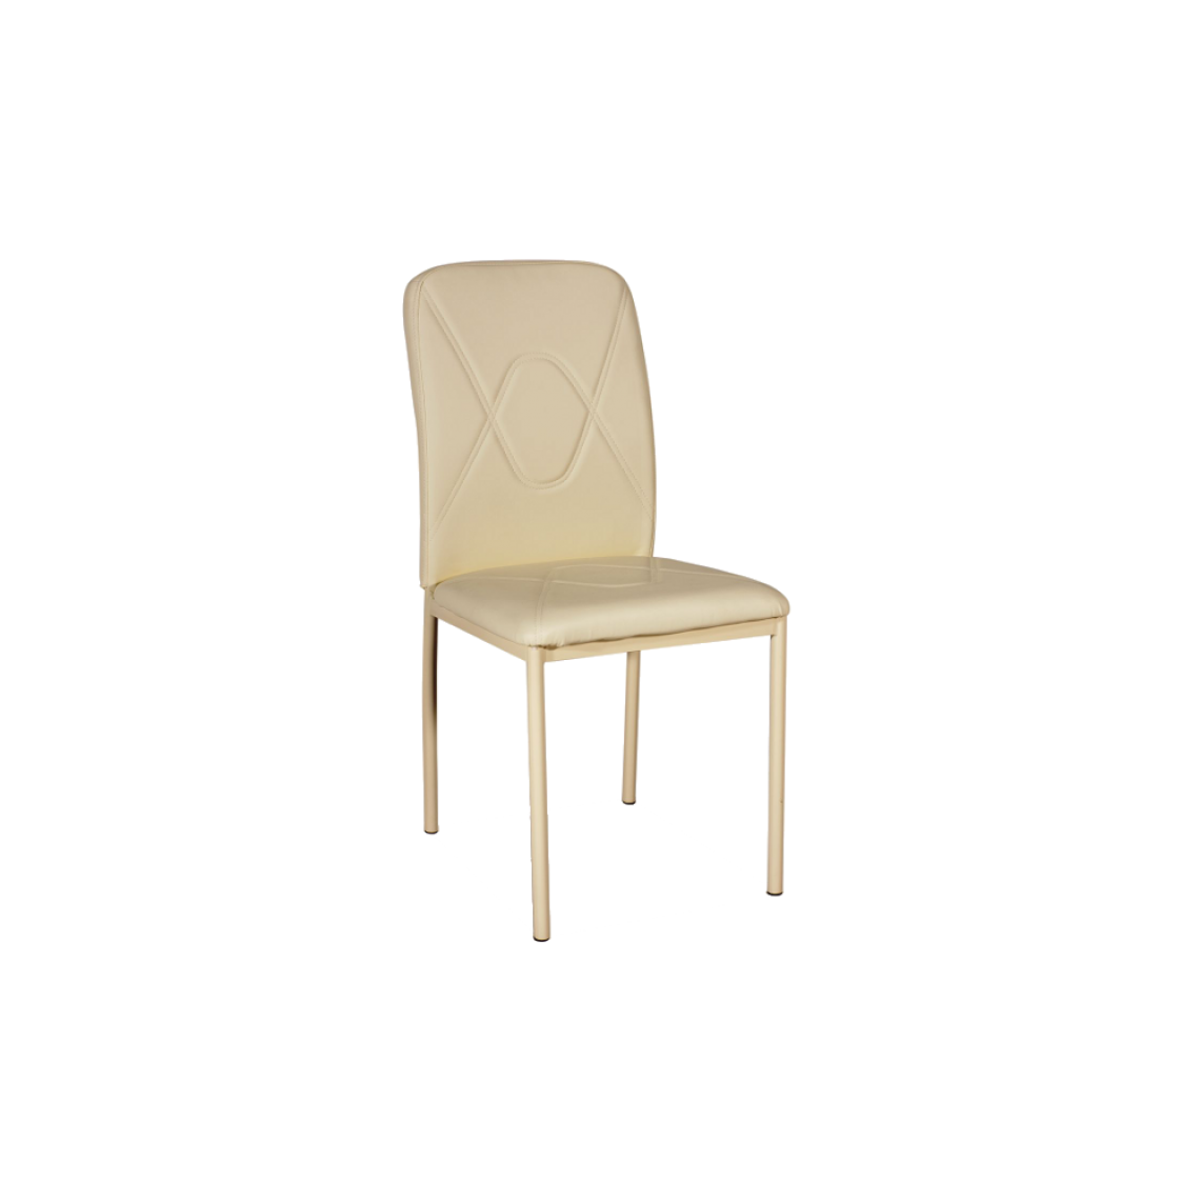 Ac-Deco Chaise moderne - H 623 - 42 x 41 x 90 cm - Beige